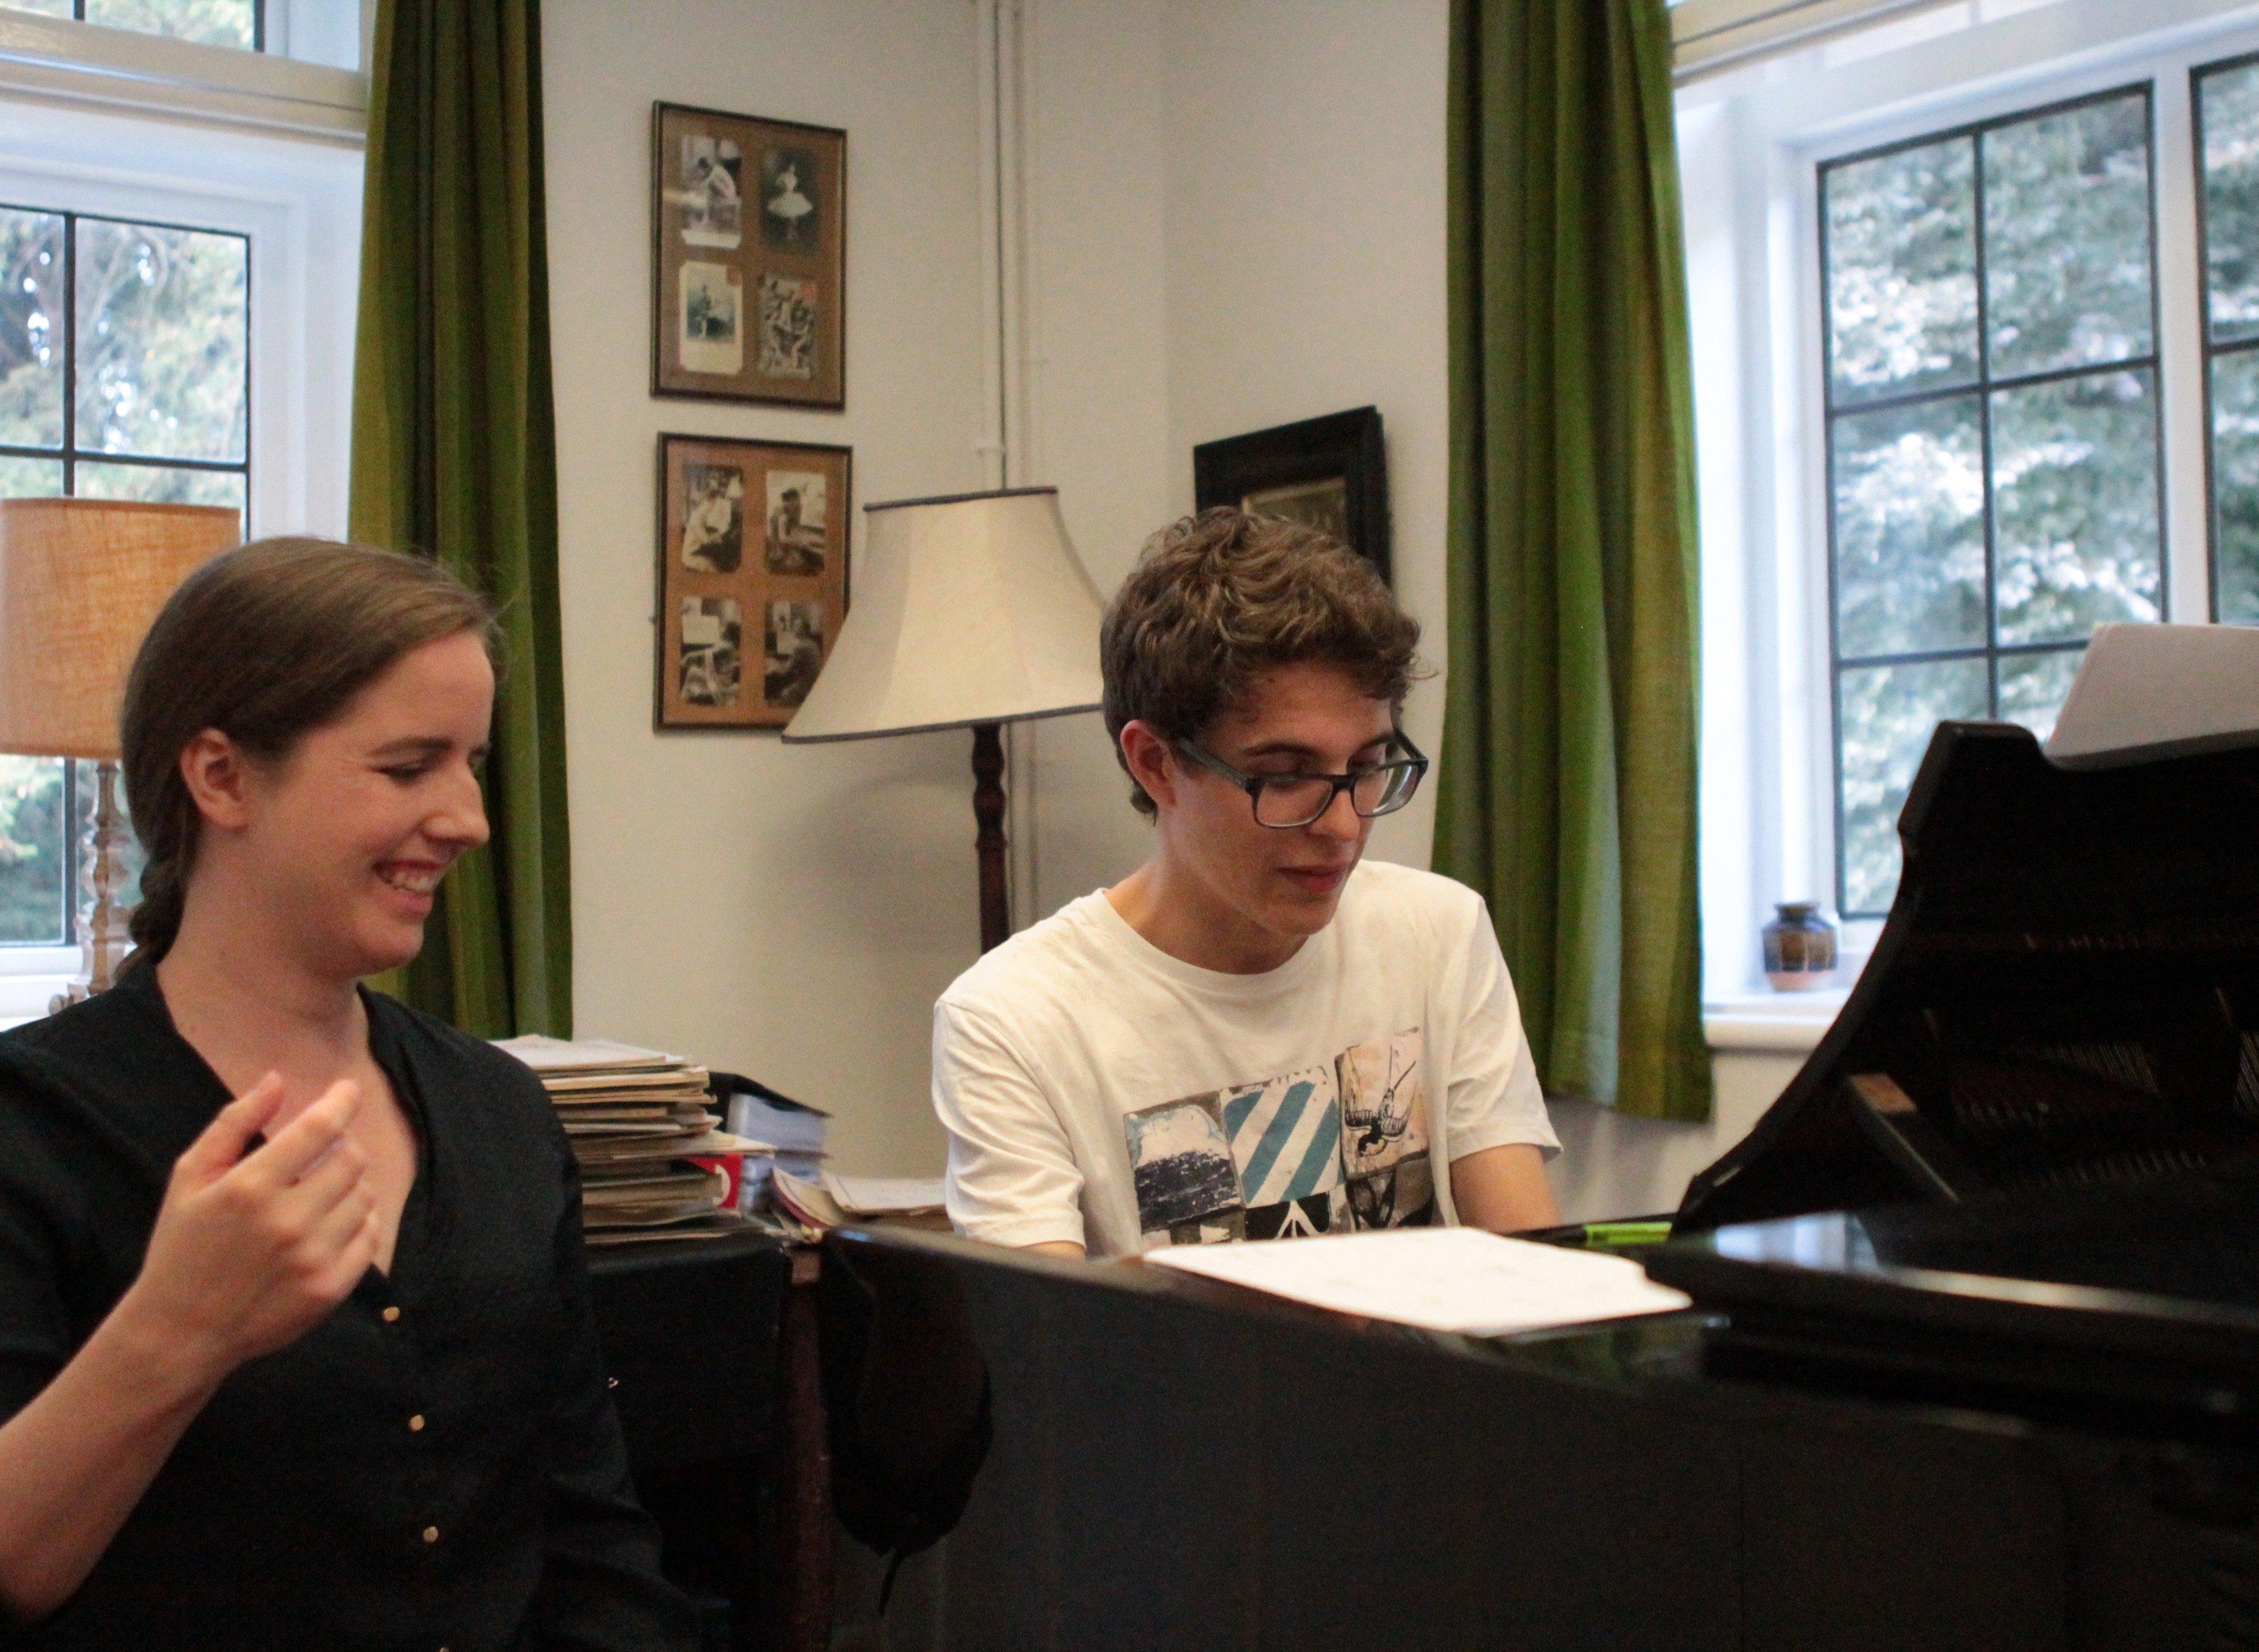 Clíodna Shanahan, piano tutor for Ingenium Academy 2015